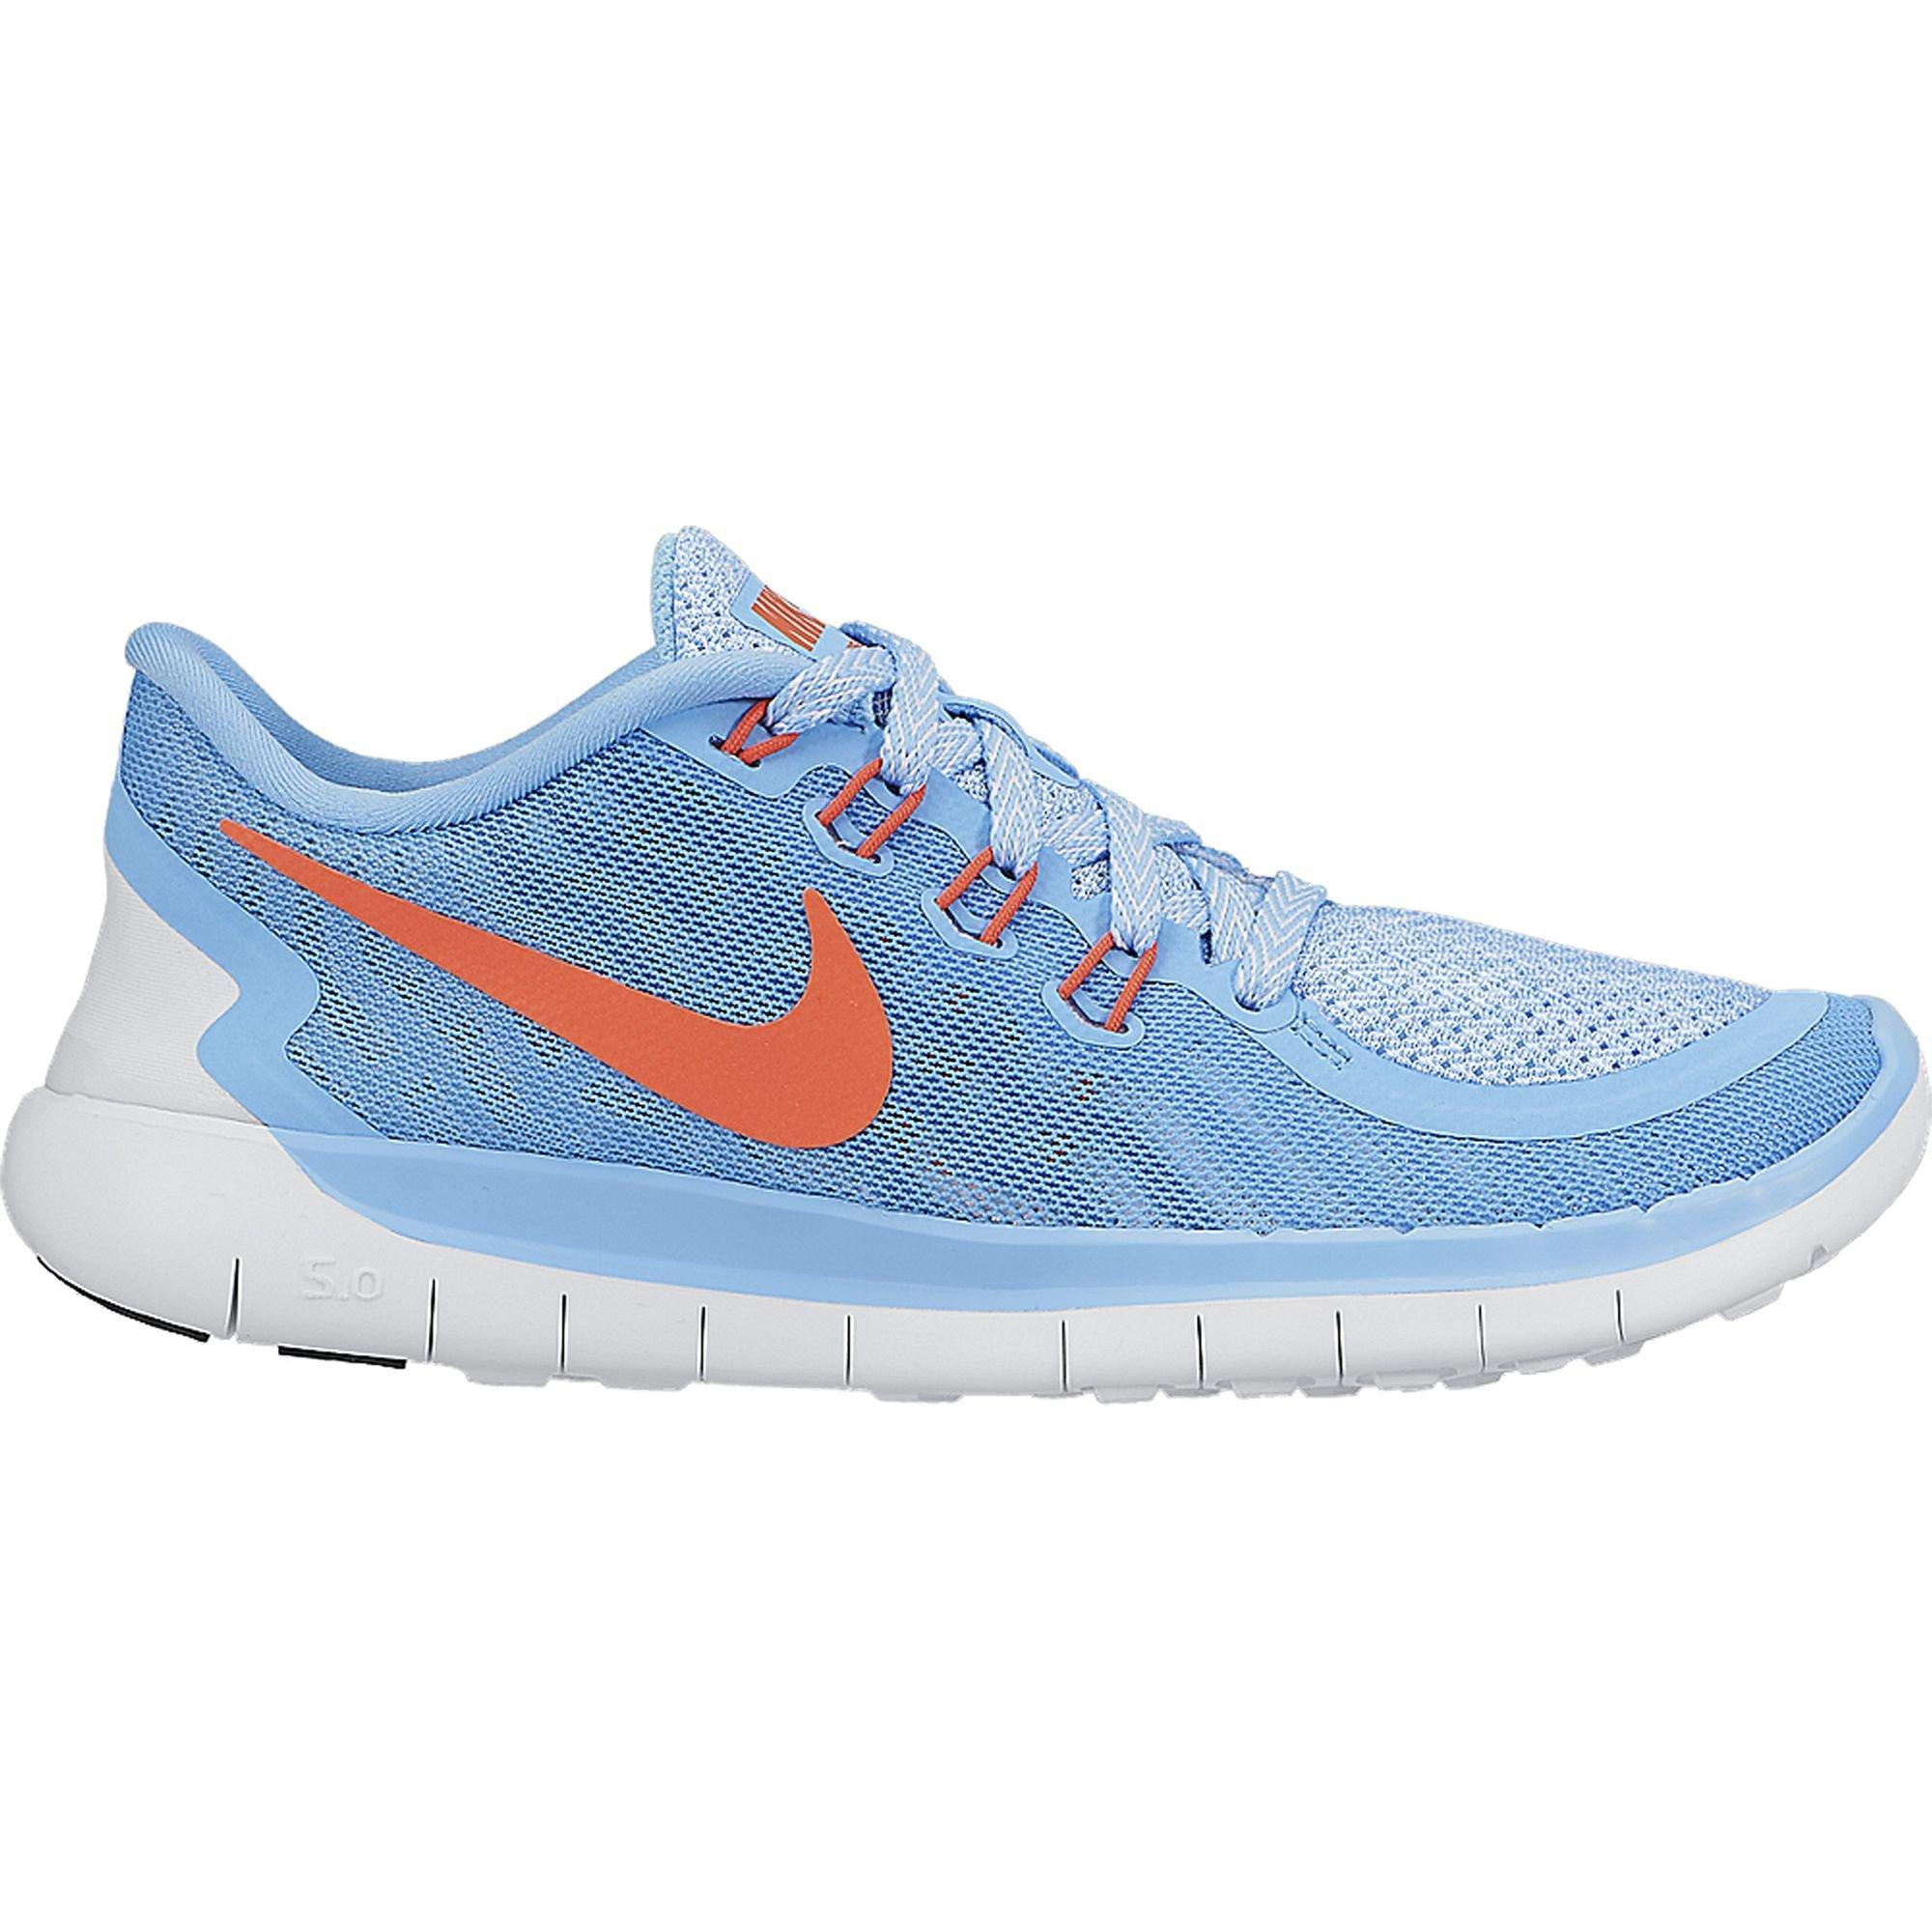 Nike Free 5.0 (GS) Laufschuhe lakeside-bright crimson-blue lagoon- 38 U4aIw